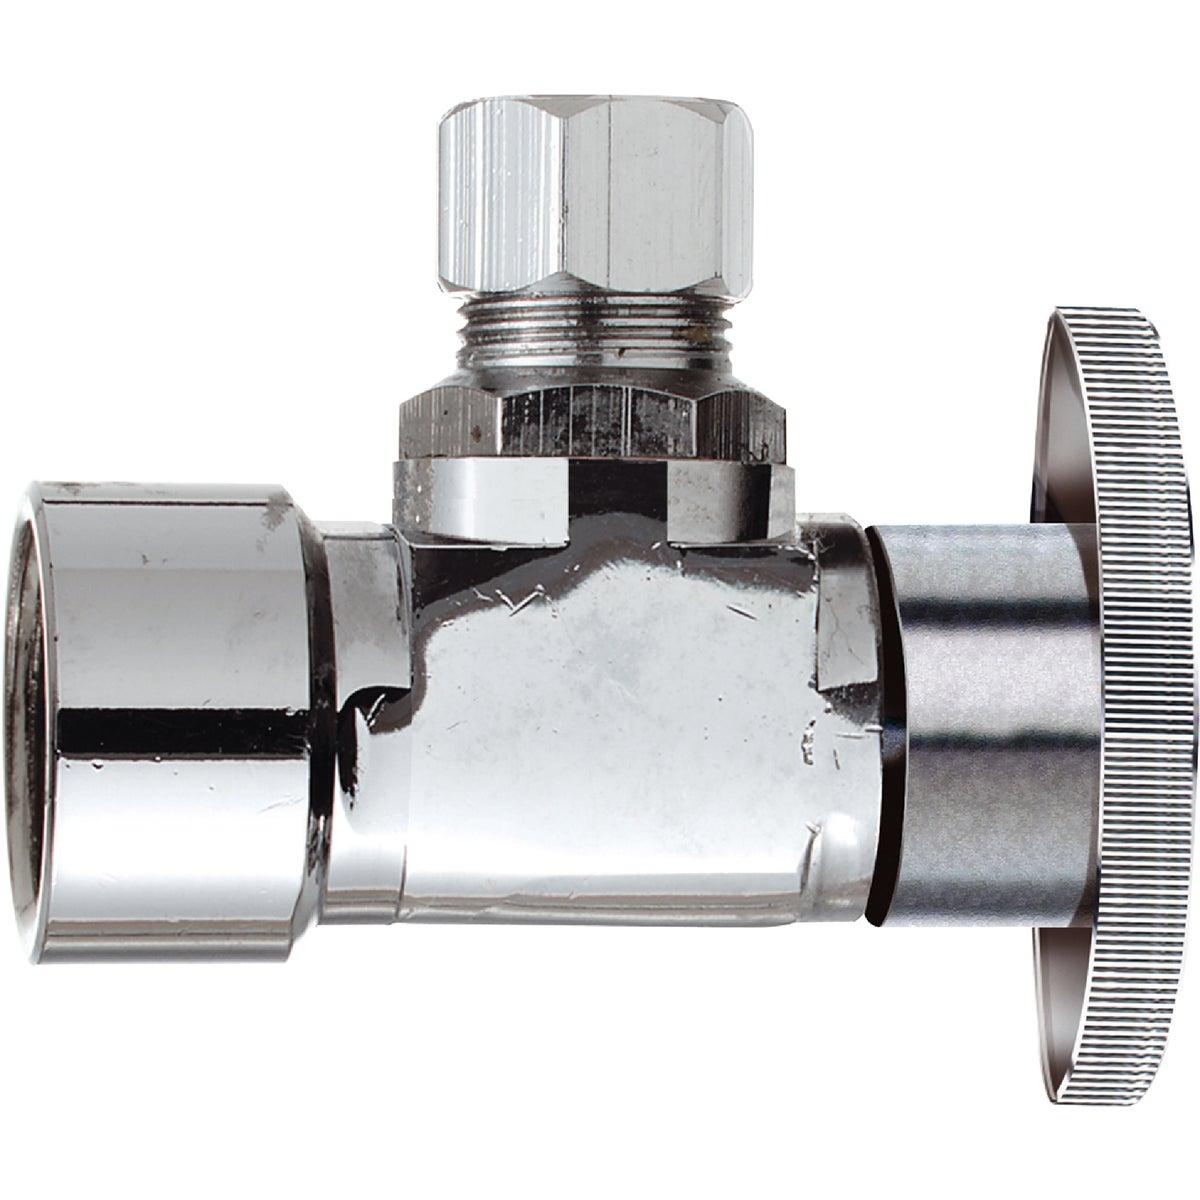 Plumb Pak/Keeney Mfg. 1/2FIPX3/8OD ANGLE VALVE 456401